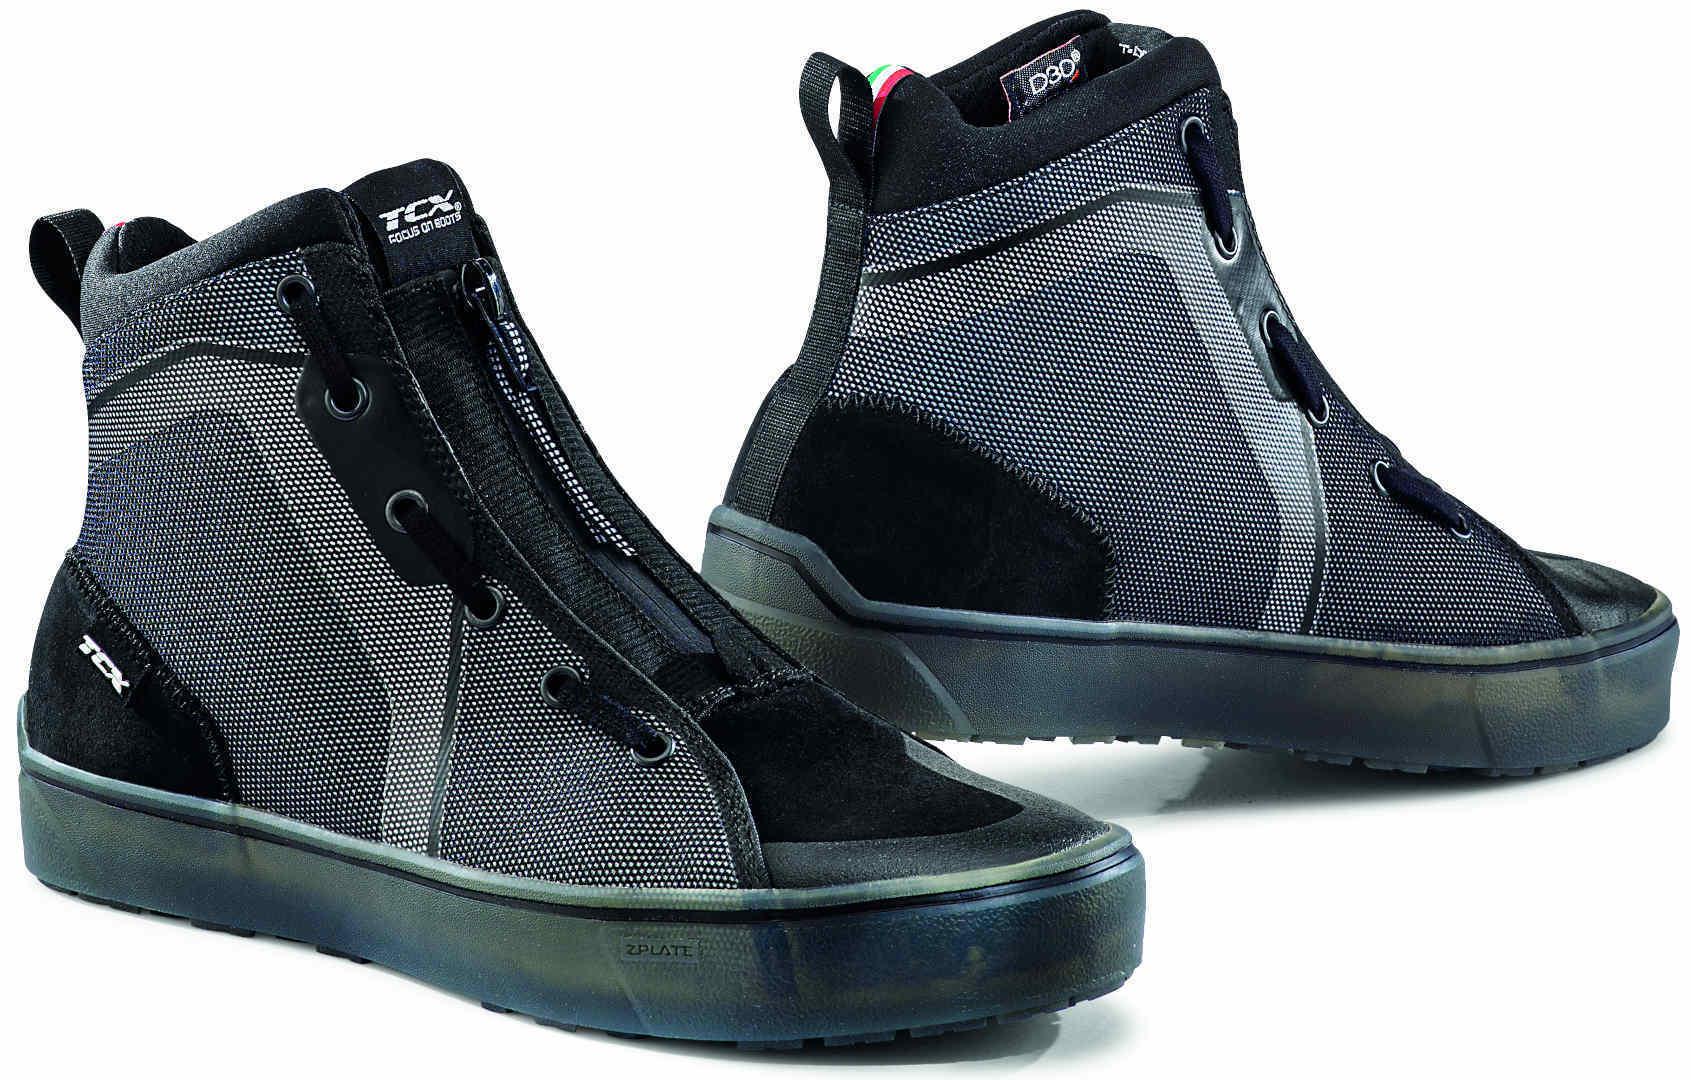 TCX Ikasu Wasserdichte Motorradschuhe, schwarz-silber, Größe 48, schwarz-silber, Größe 48